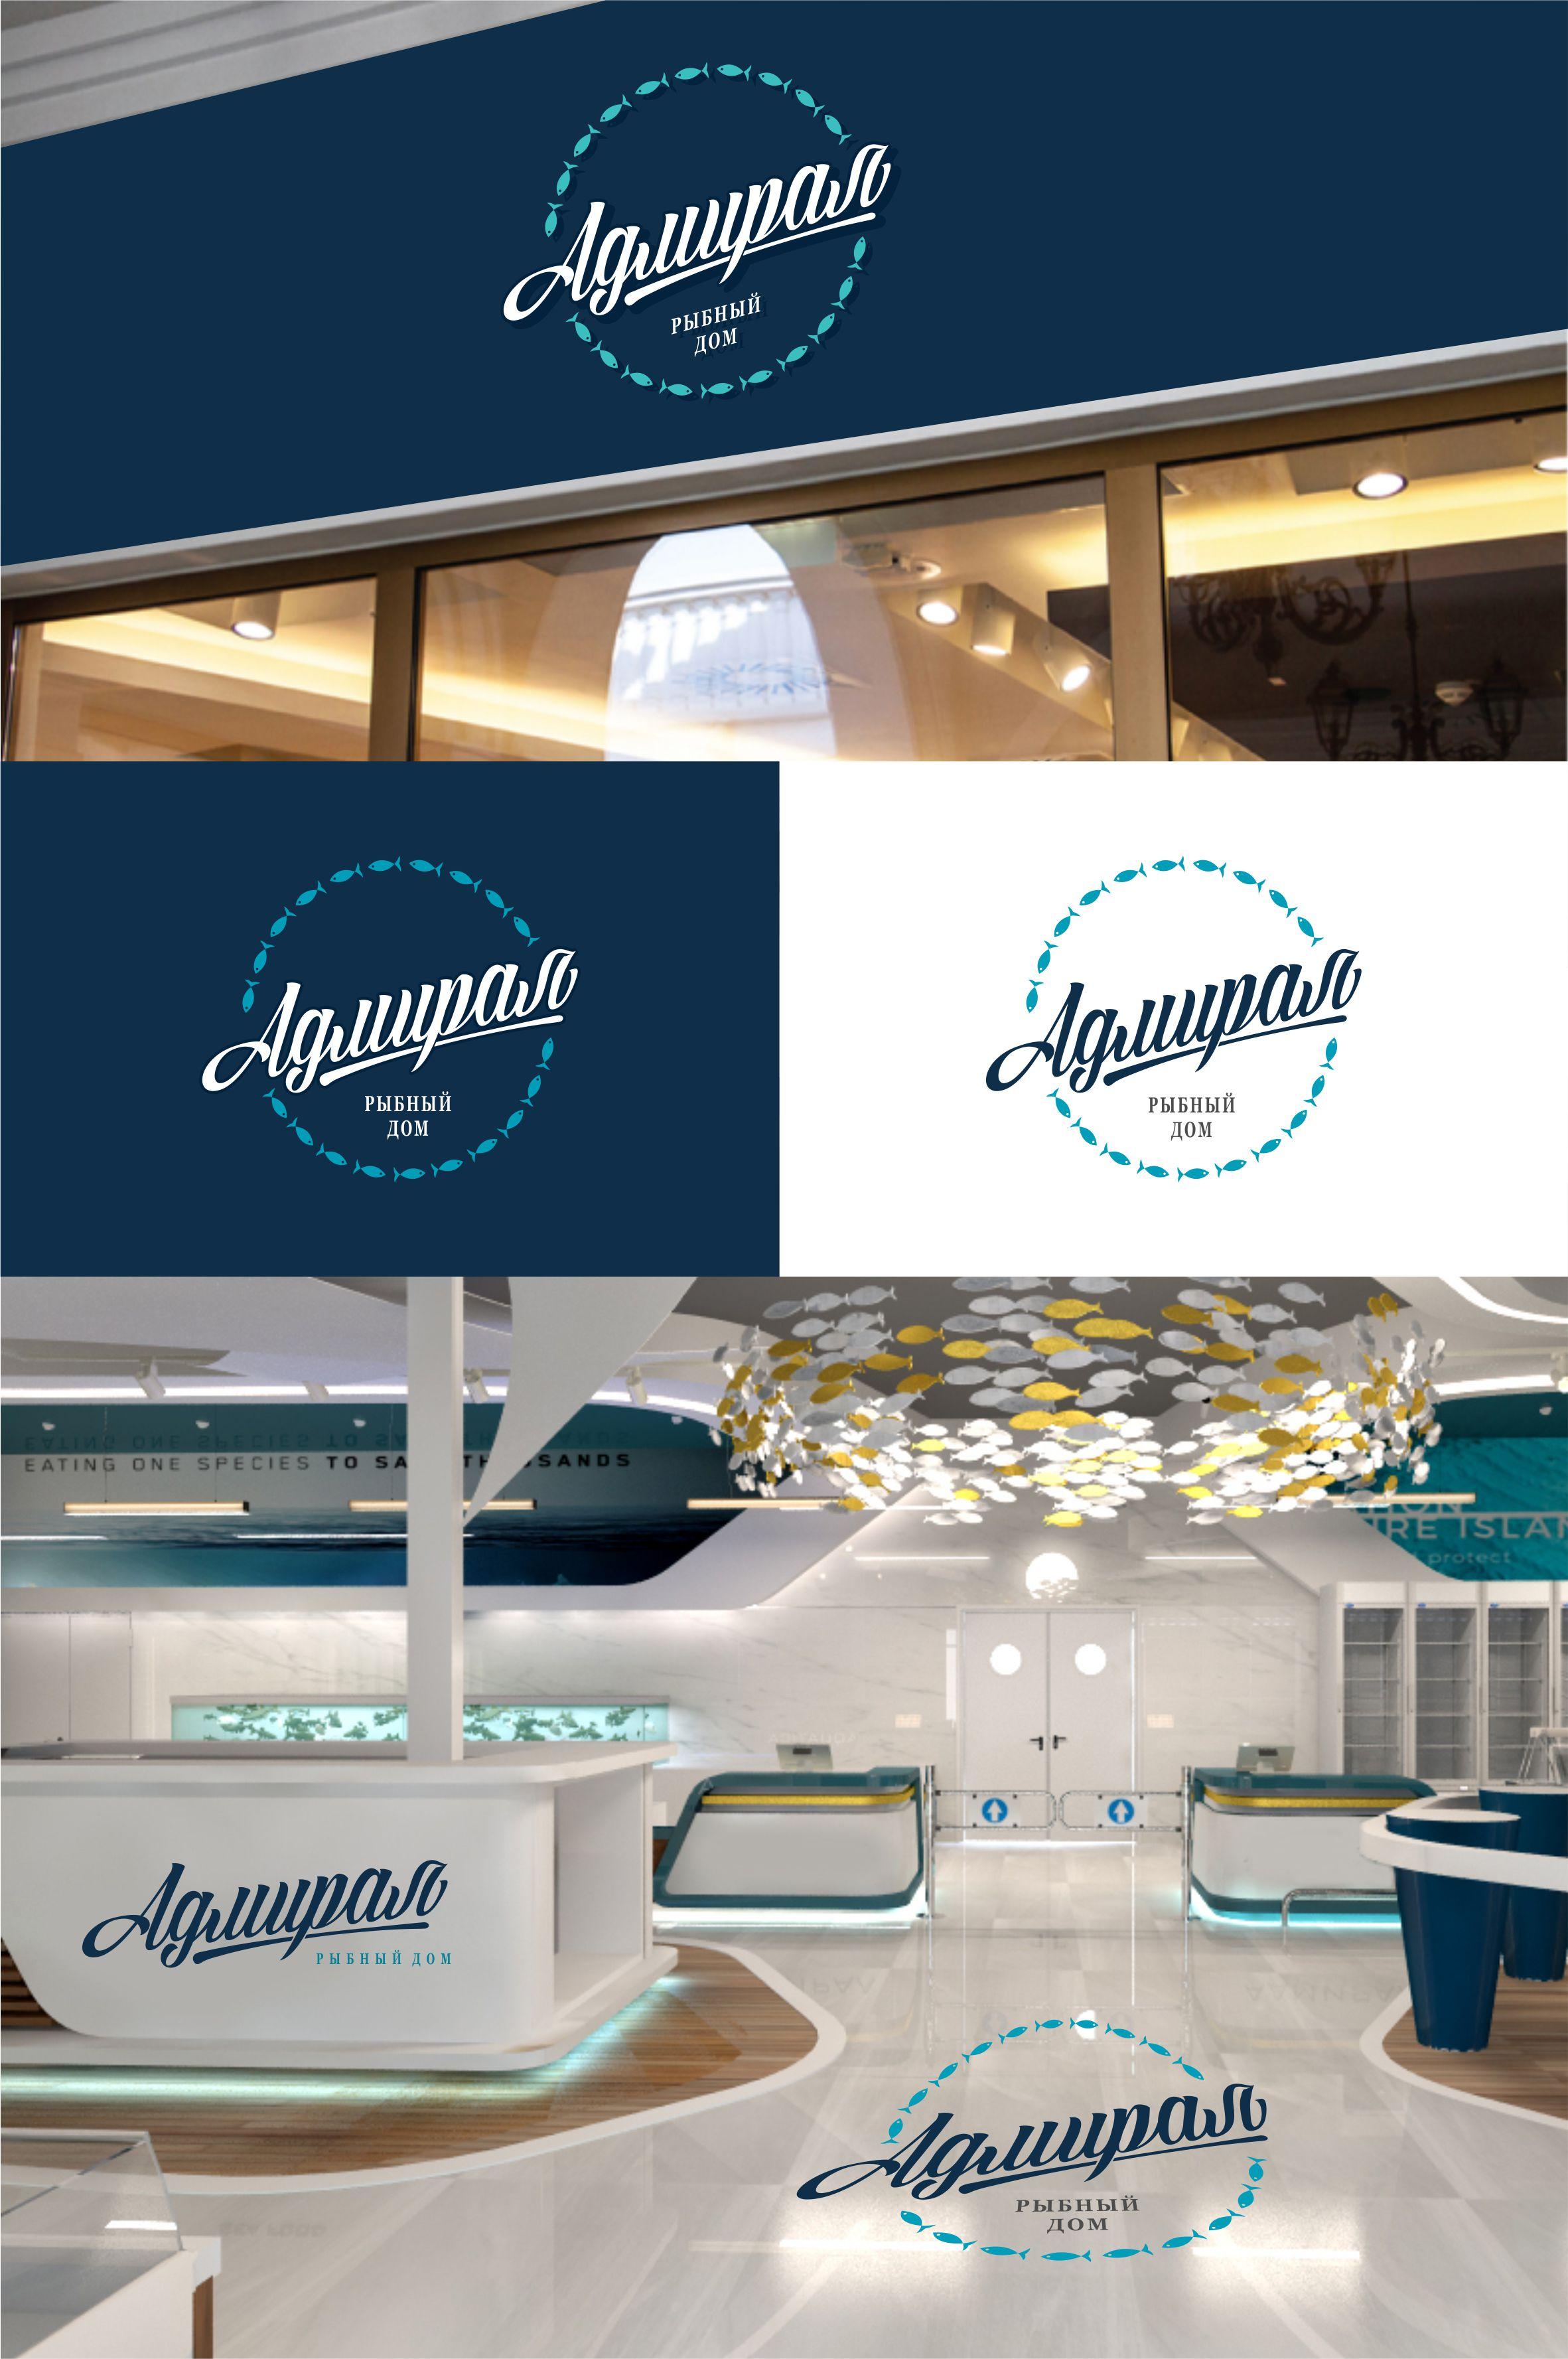 Разработка фирменного стиля для рыбного магазина фото f_9865a0def967920d.jpg